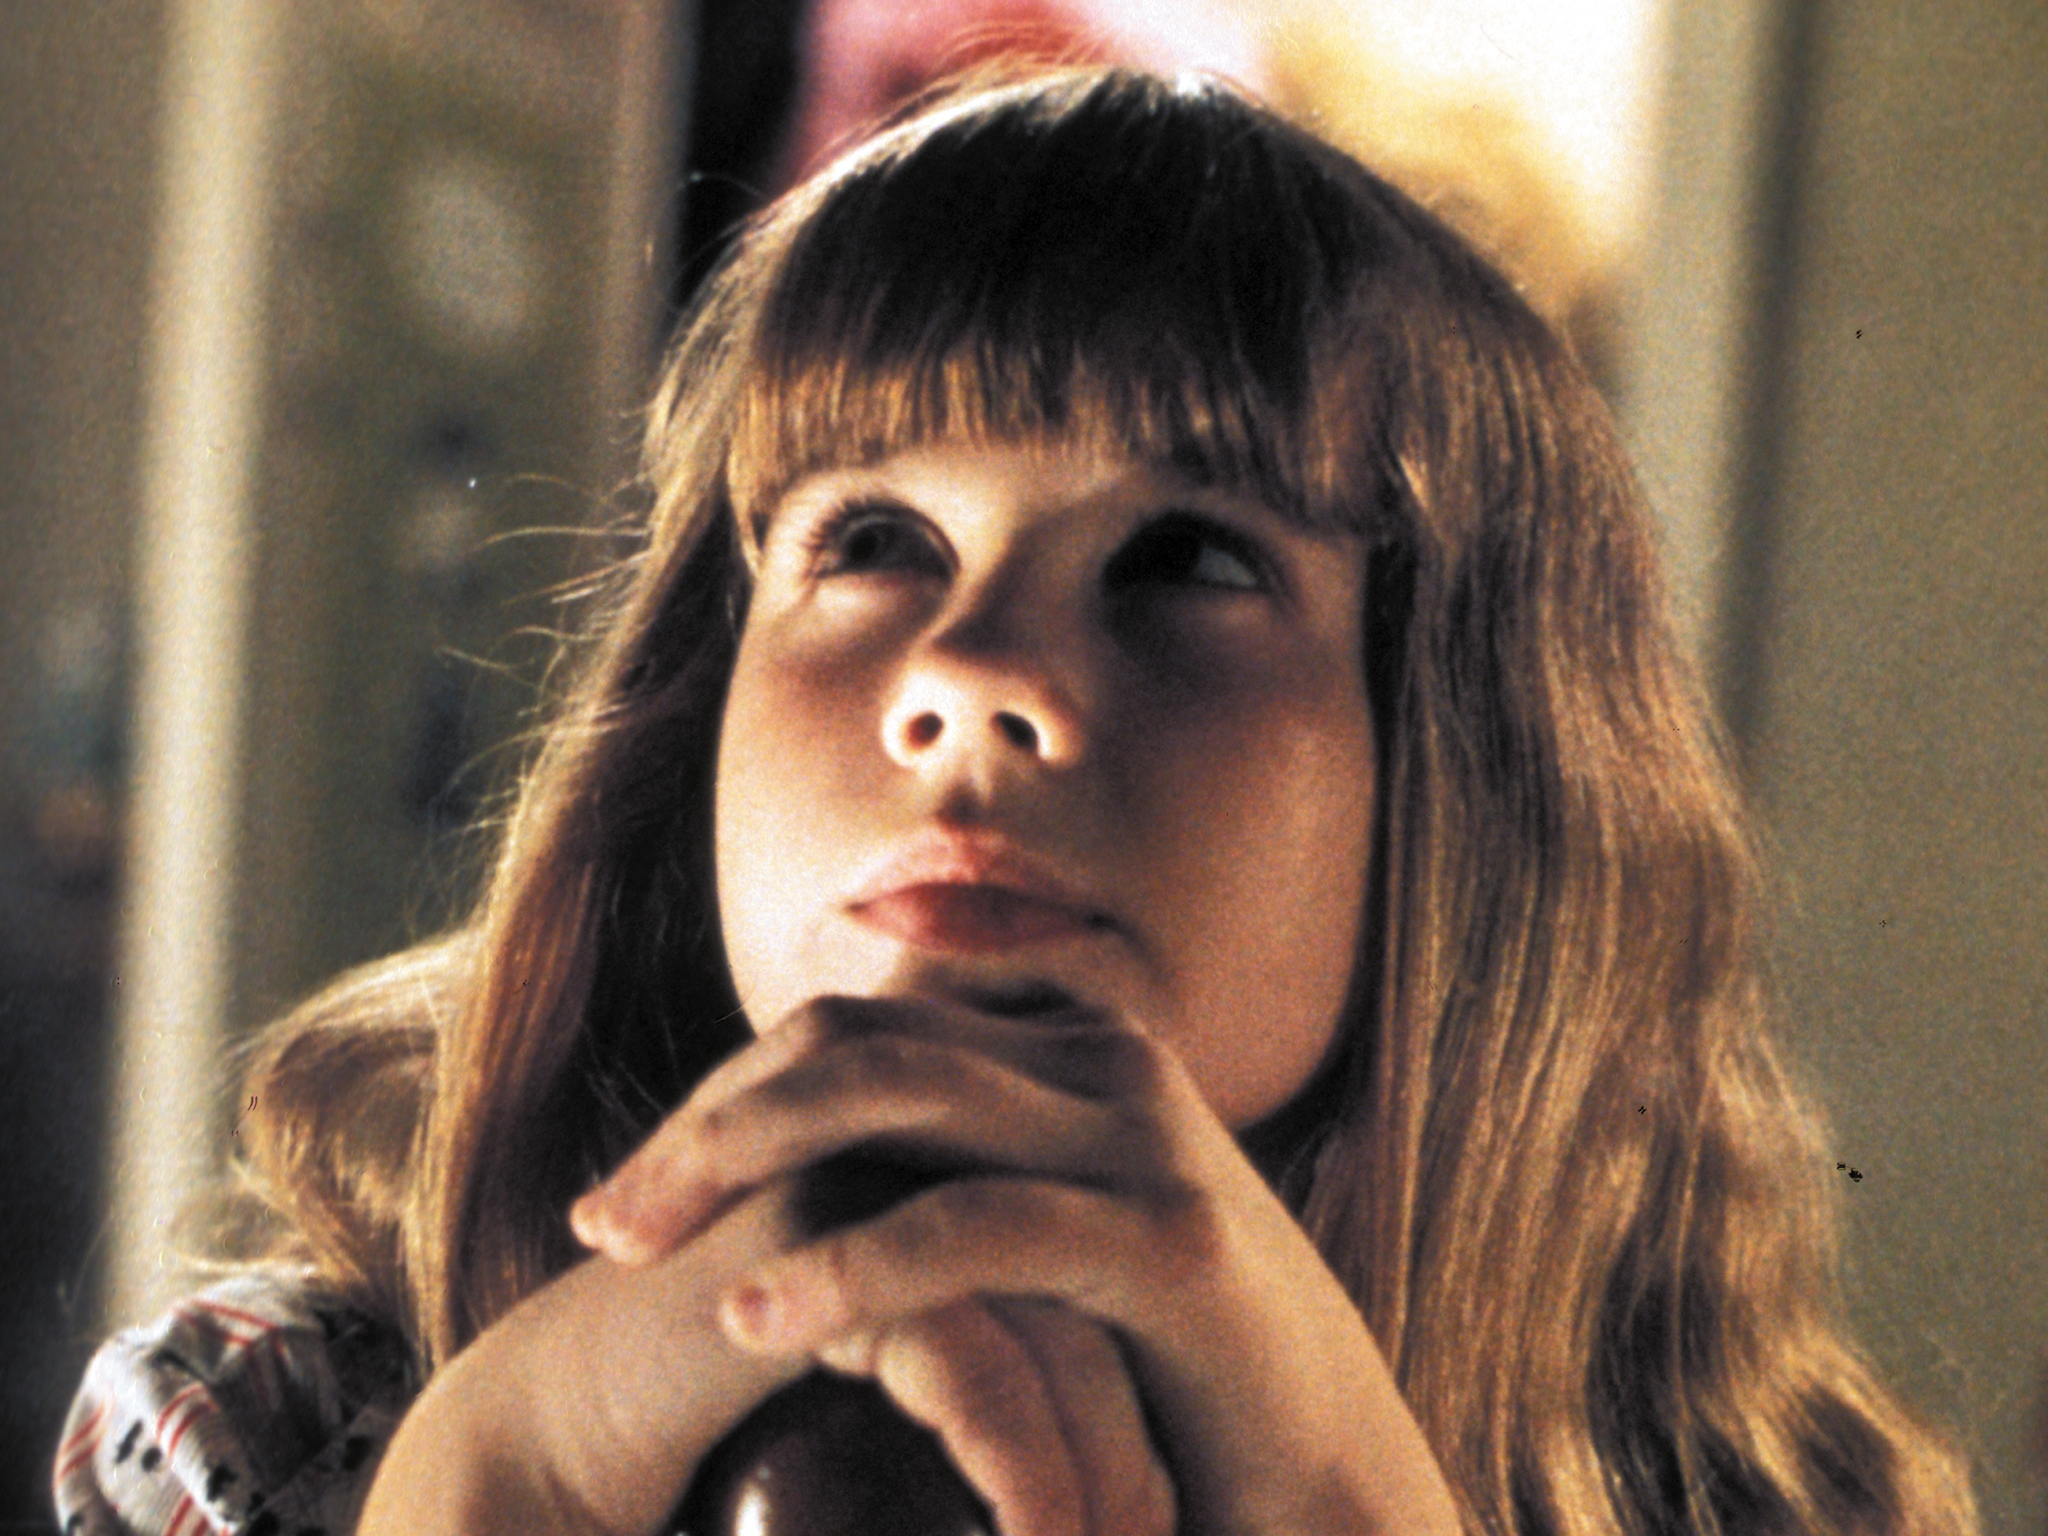 The Exorcist (1972)